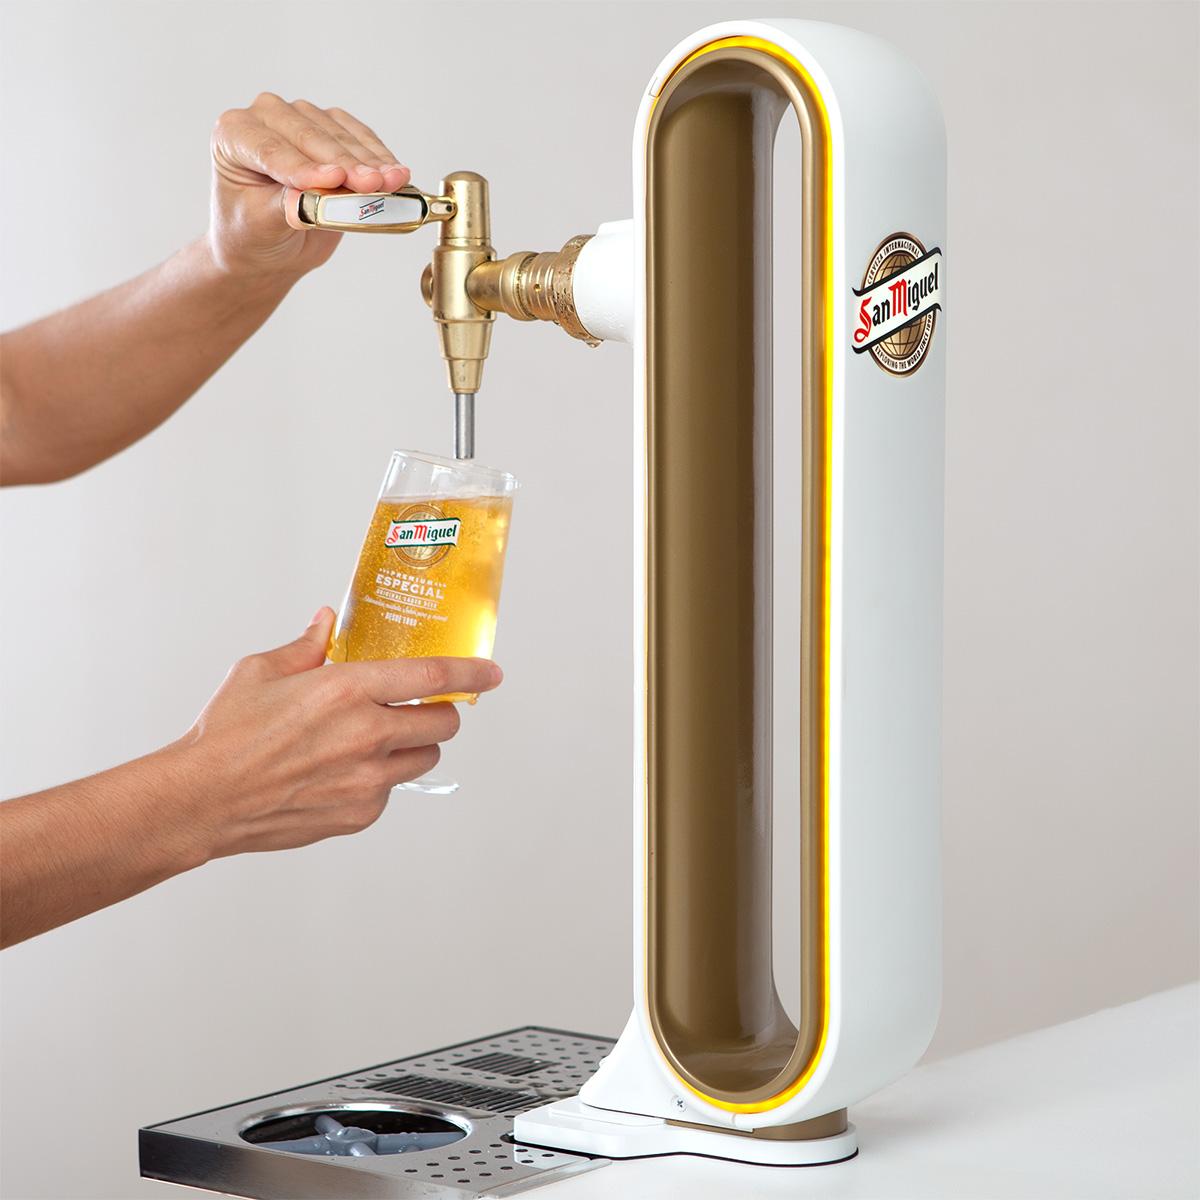 SanMiguel_beer_web